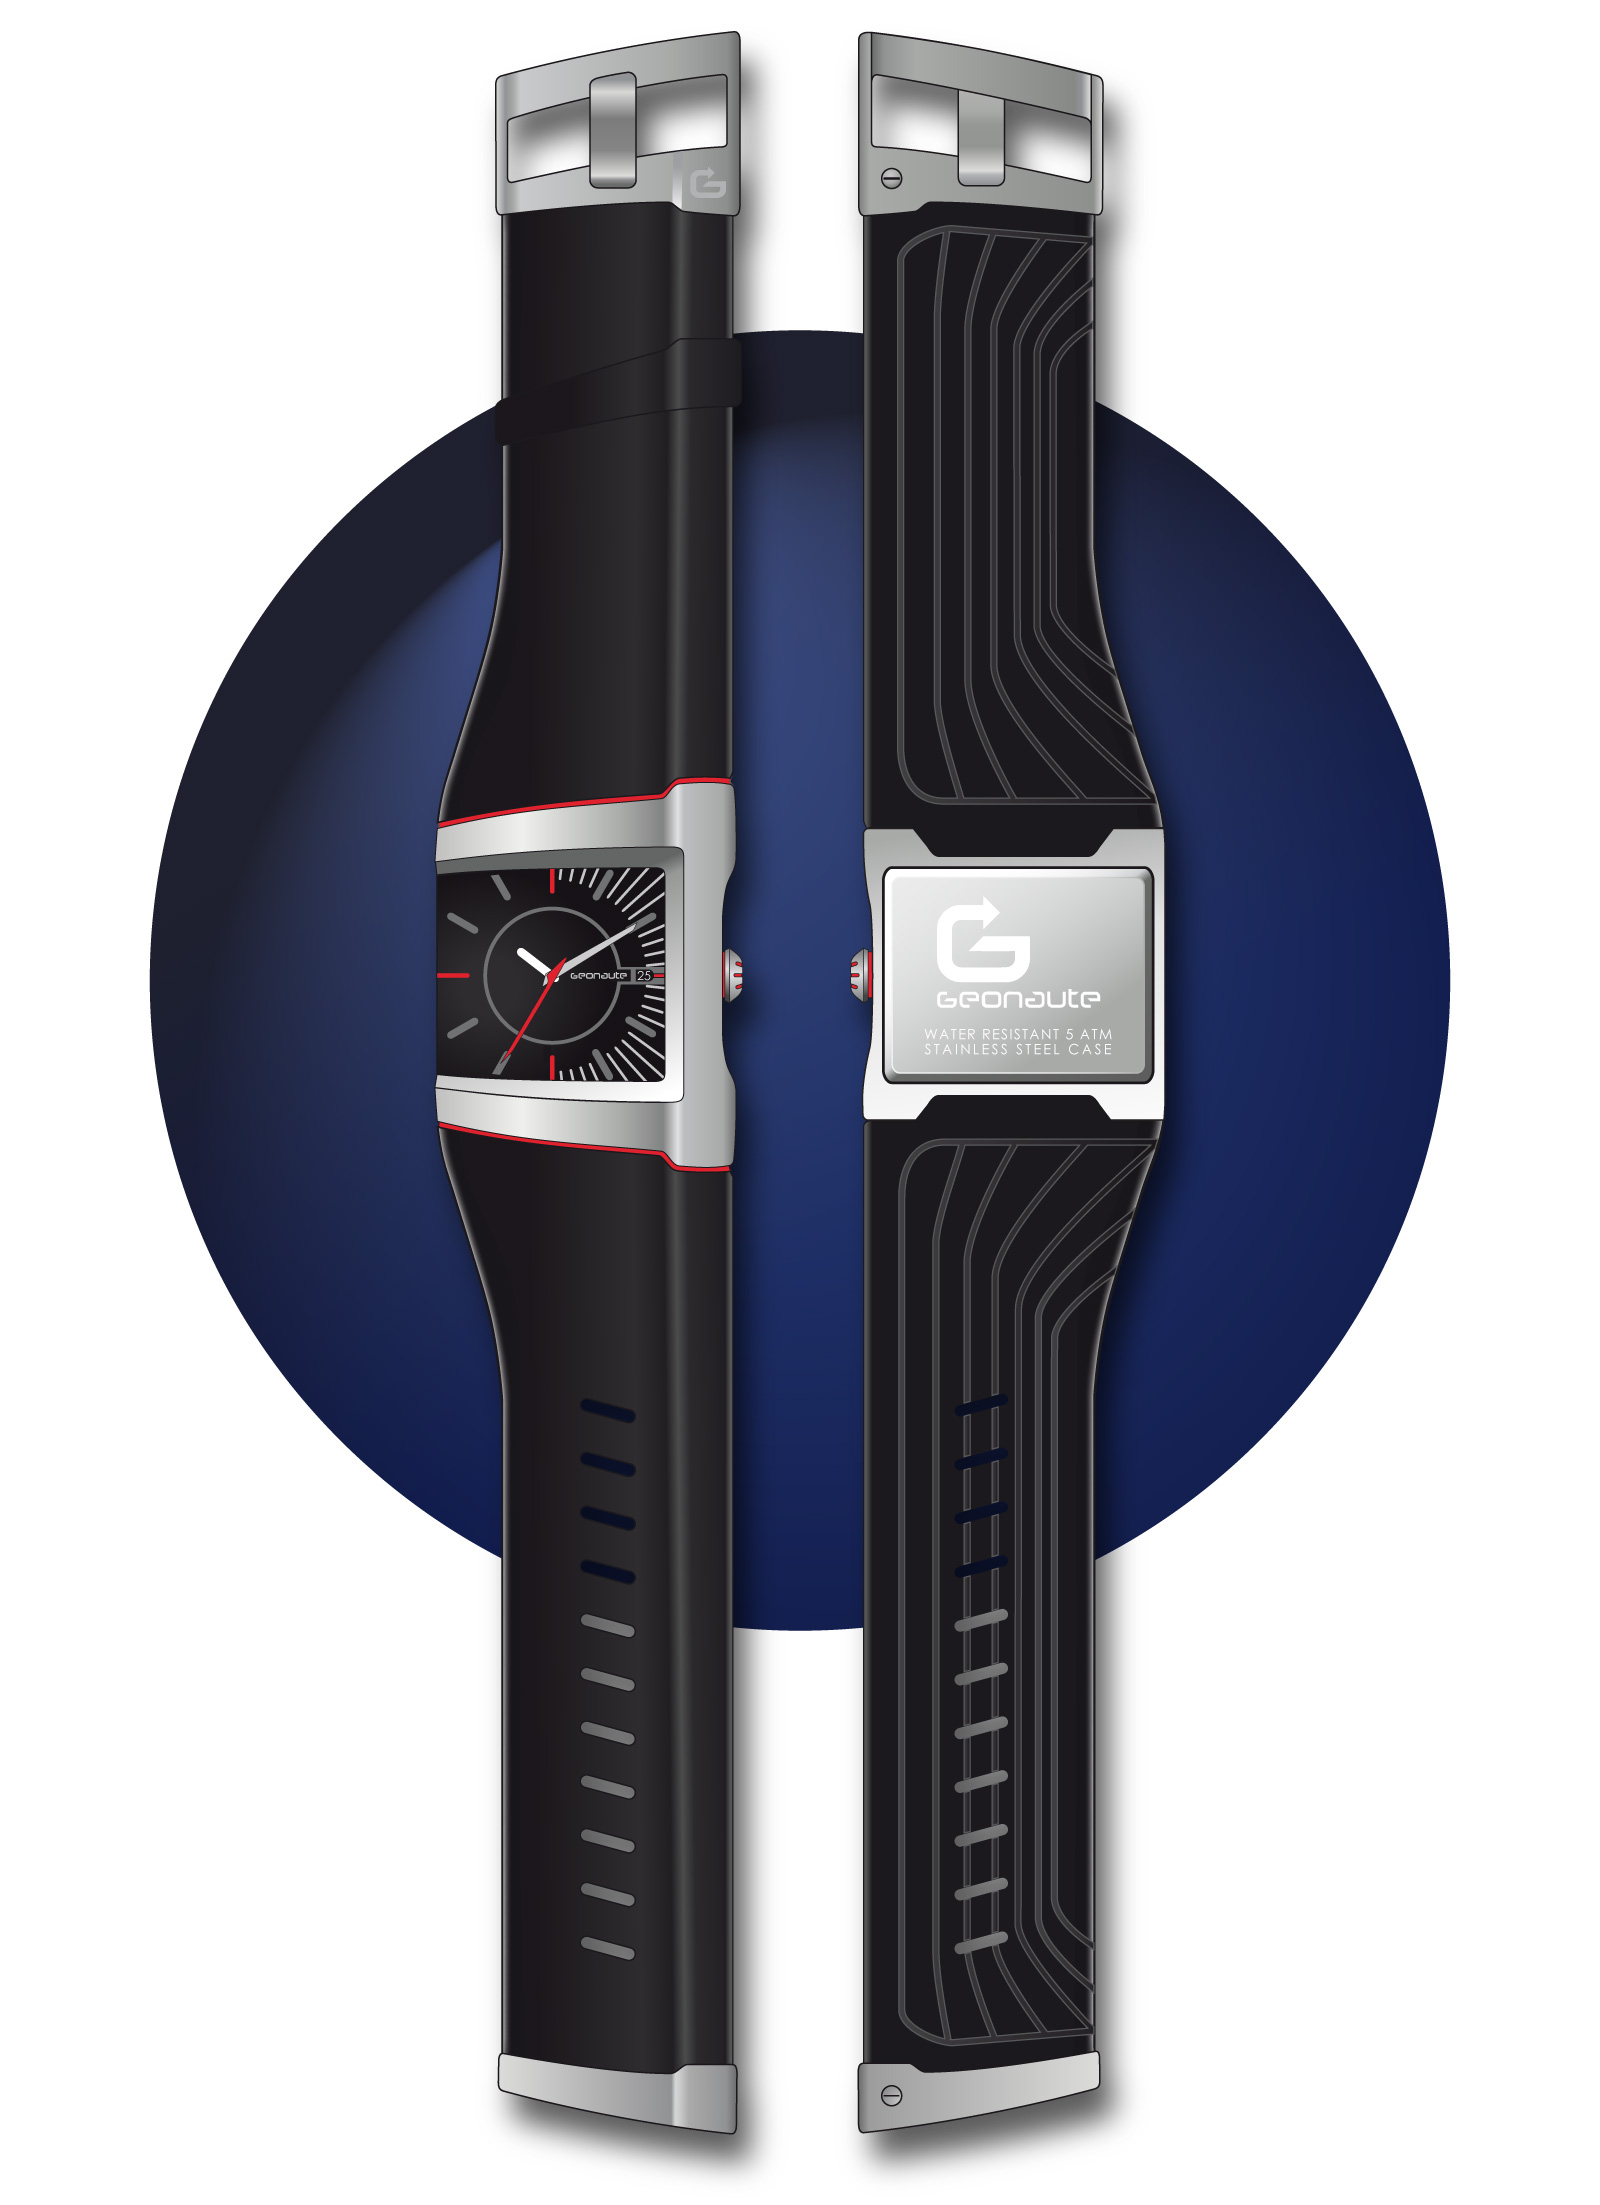 Geonaute-SK300-Design-Final-1600X2205px.jpg